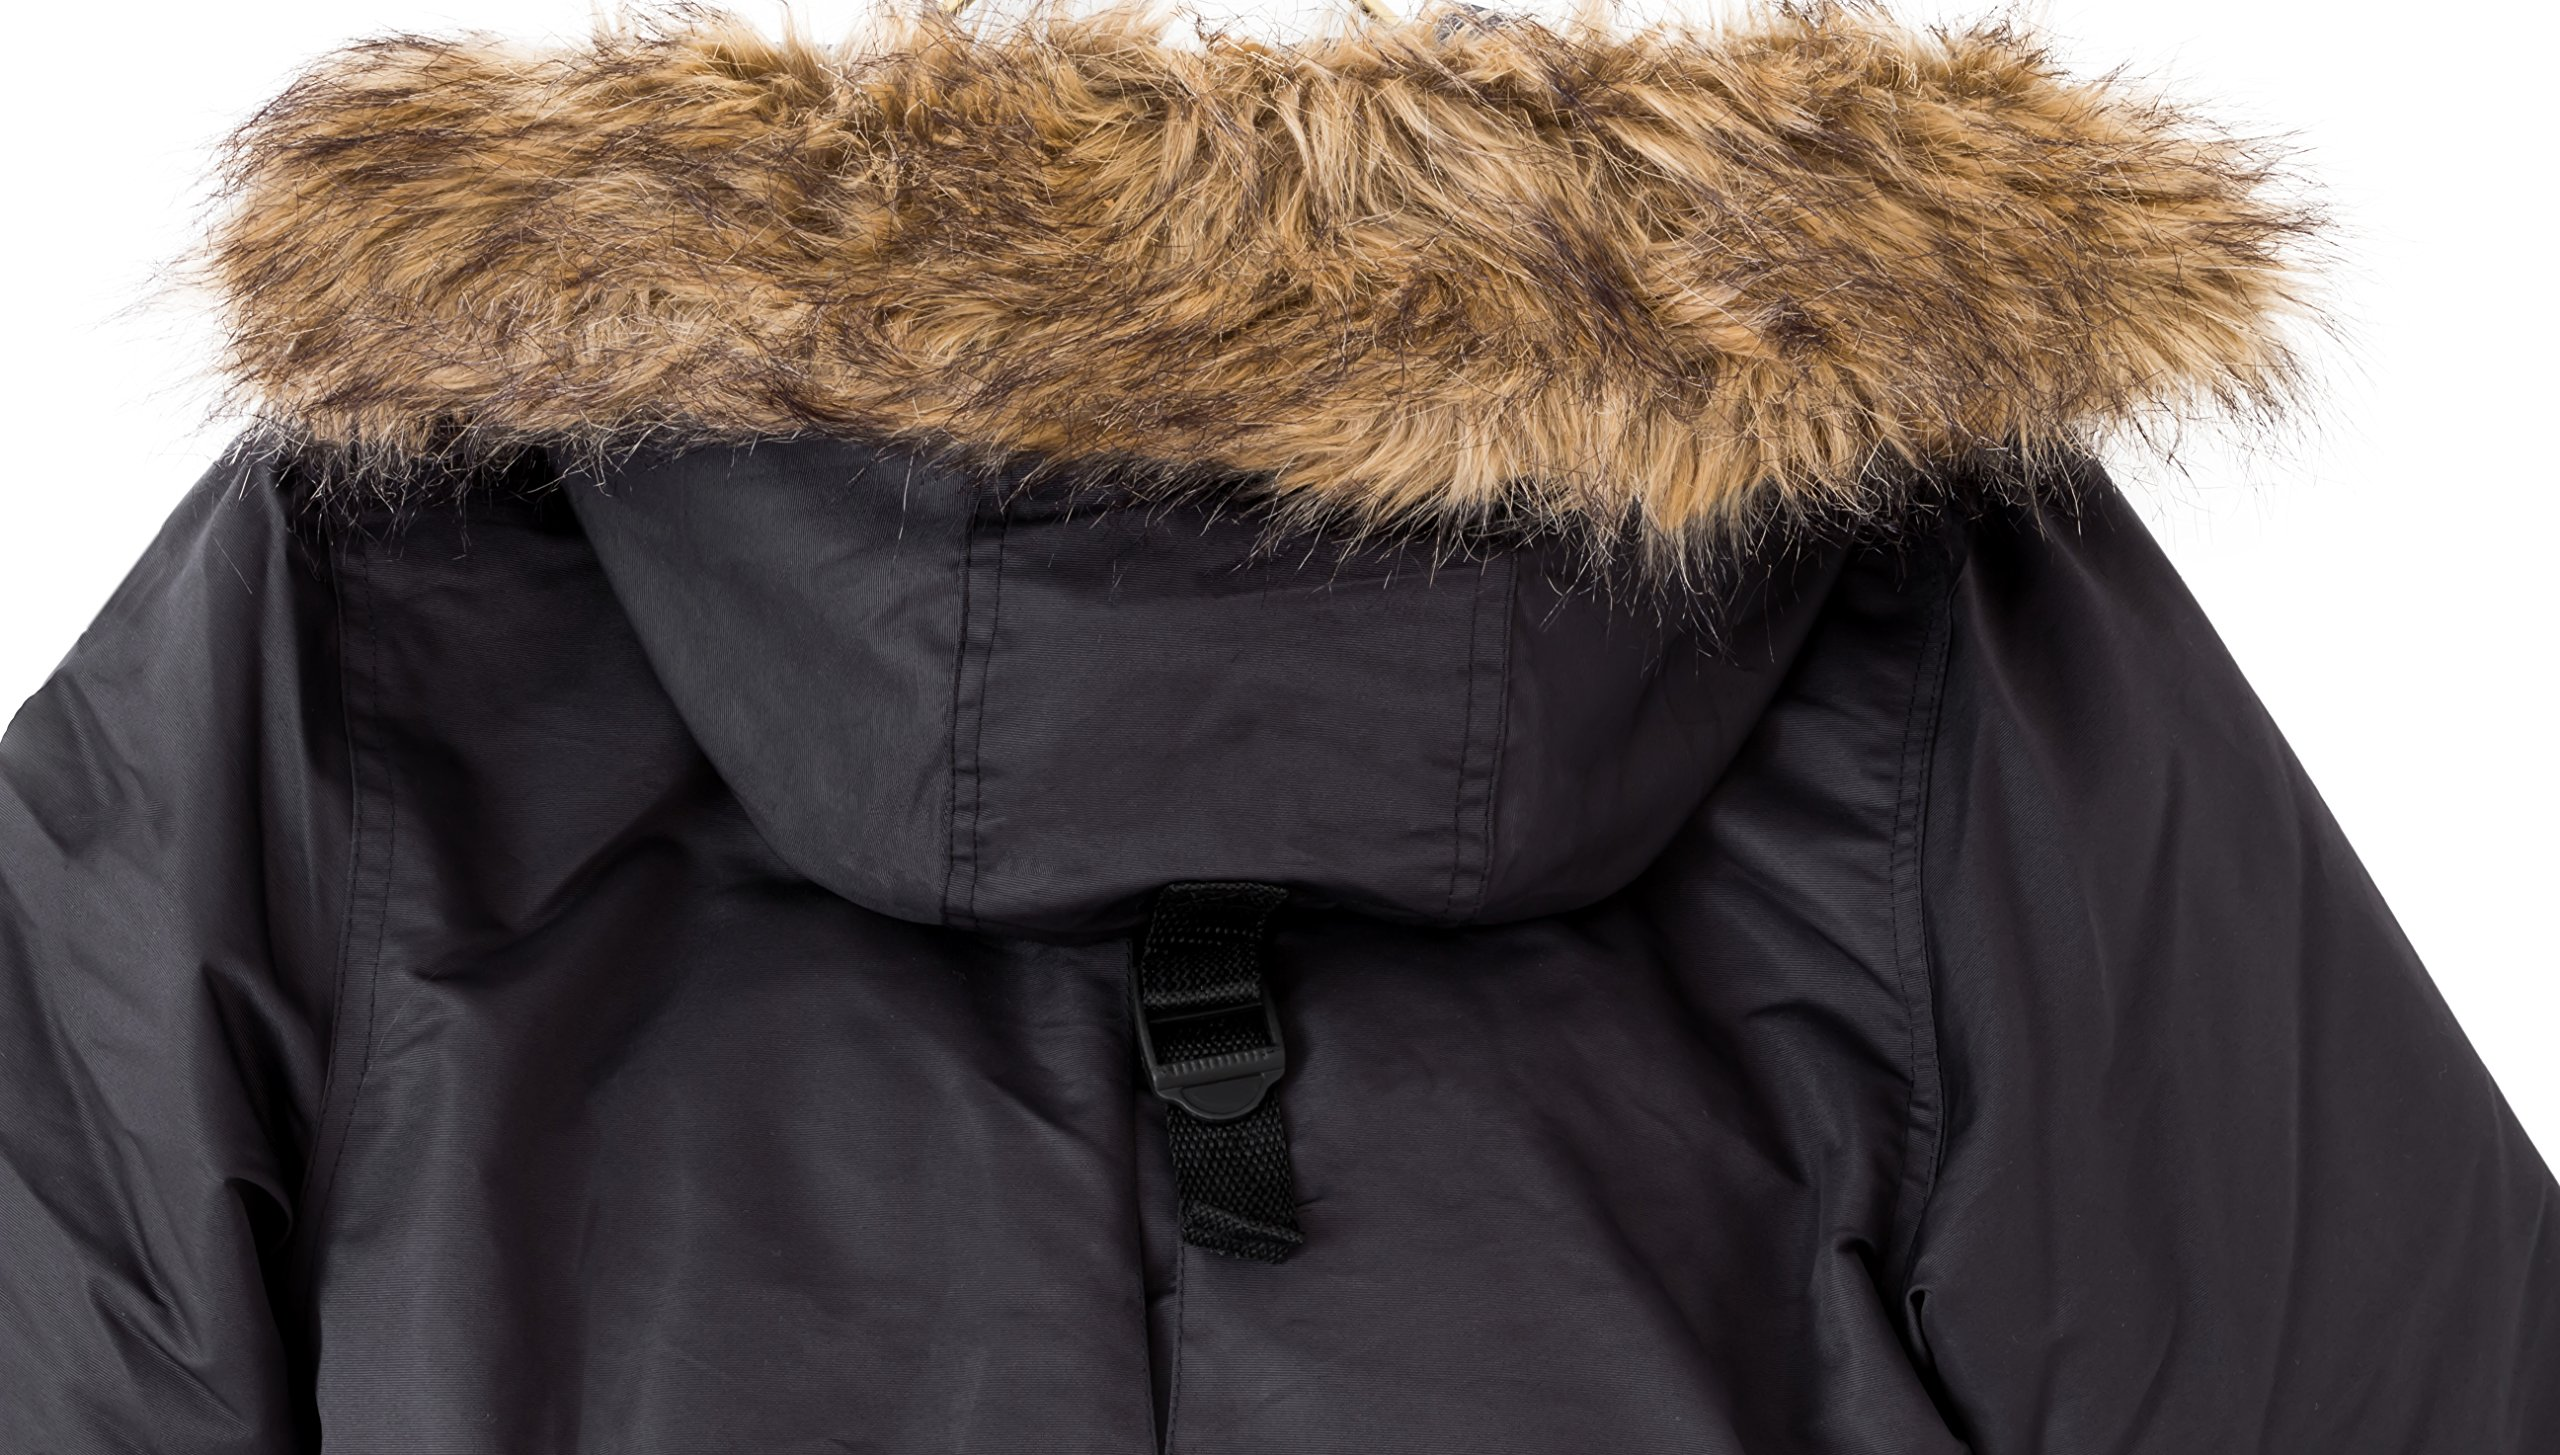 2d8690c1523e The Polar Club Boys  Canada Parka Winter Coat W Removable Fur ...